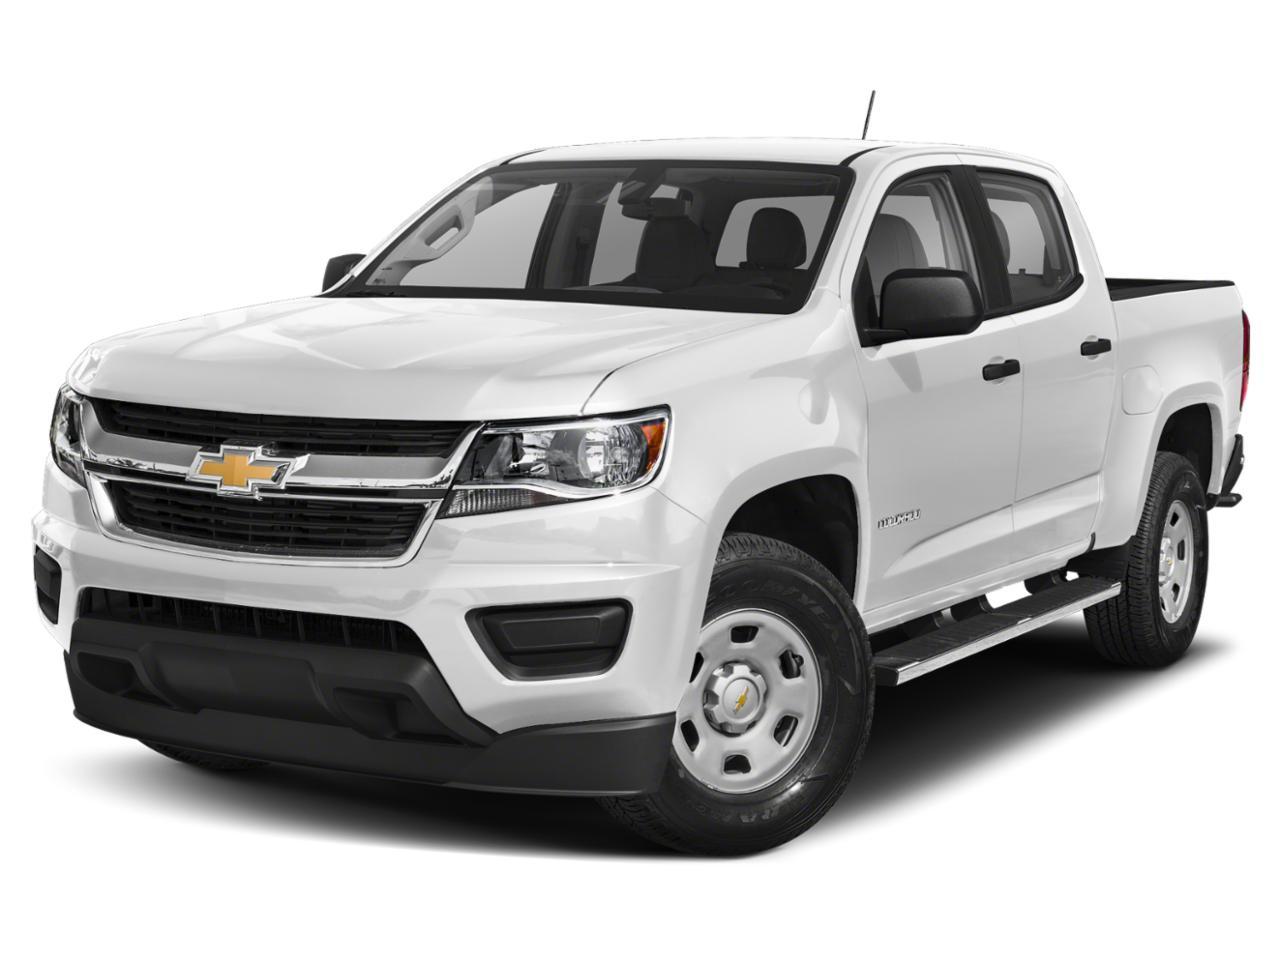 2019 Chevrolet Colorado WORK TRUCK Crew Cab Pickup Slide